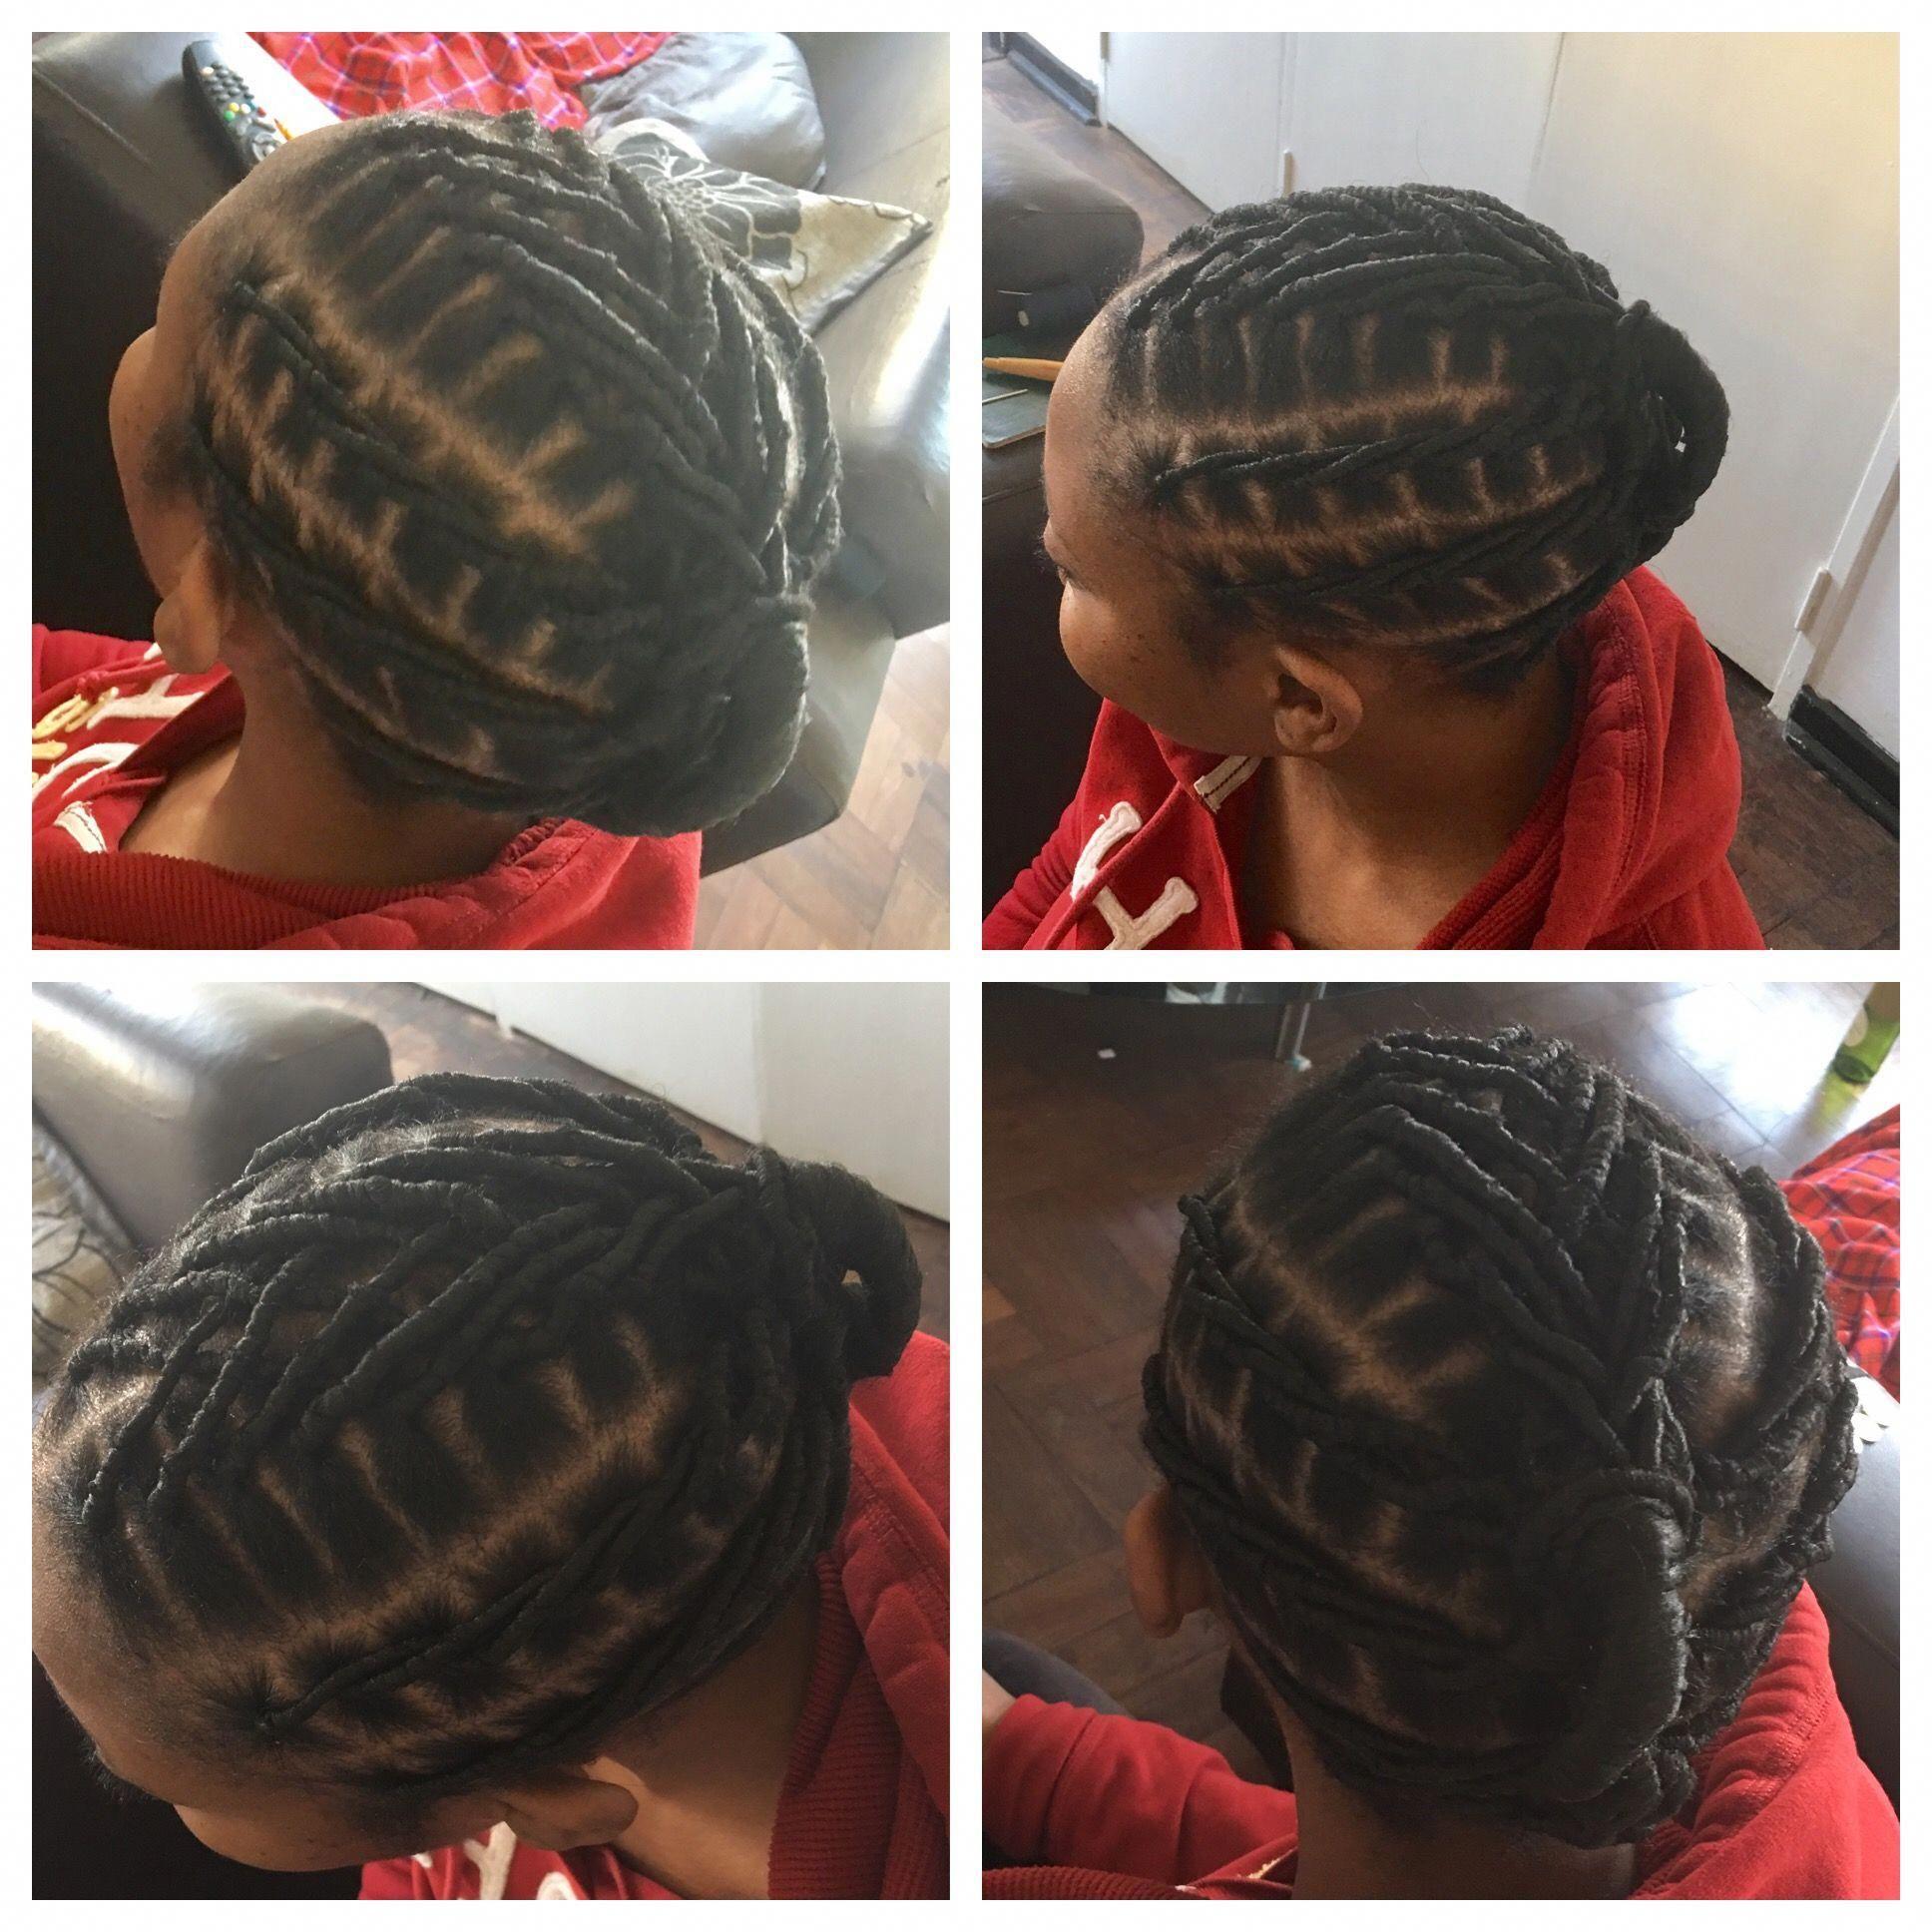 Braid Hairstyles Cornrows Boy Twistbraids Natural Afro Hairstyles Natural Hair Styles For Black Women Brazilian Wool Hairstyles